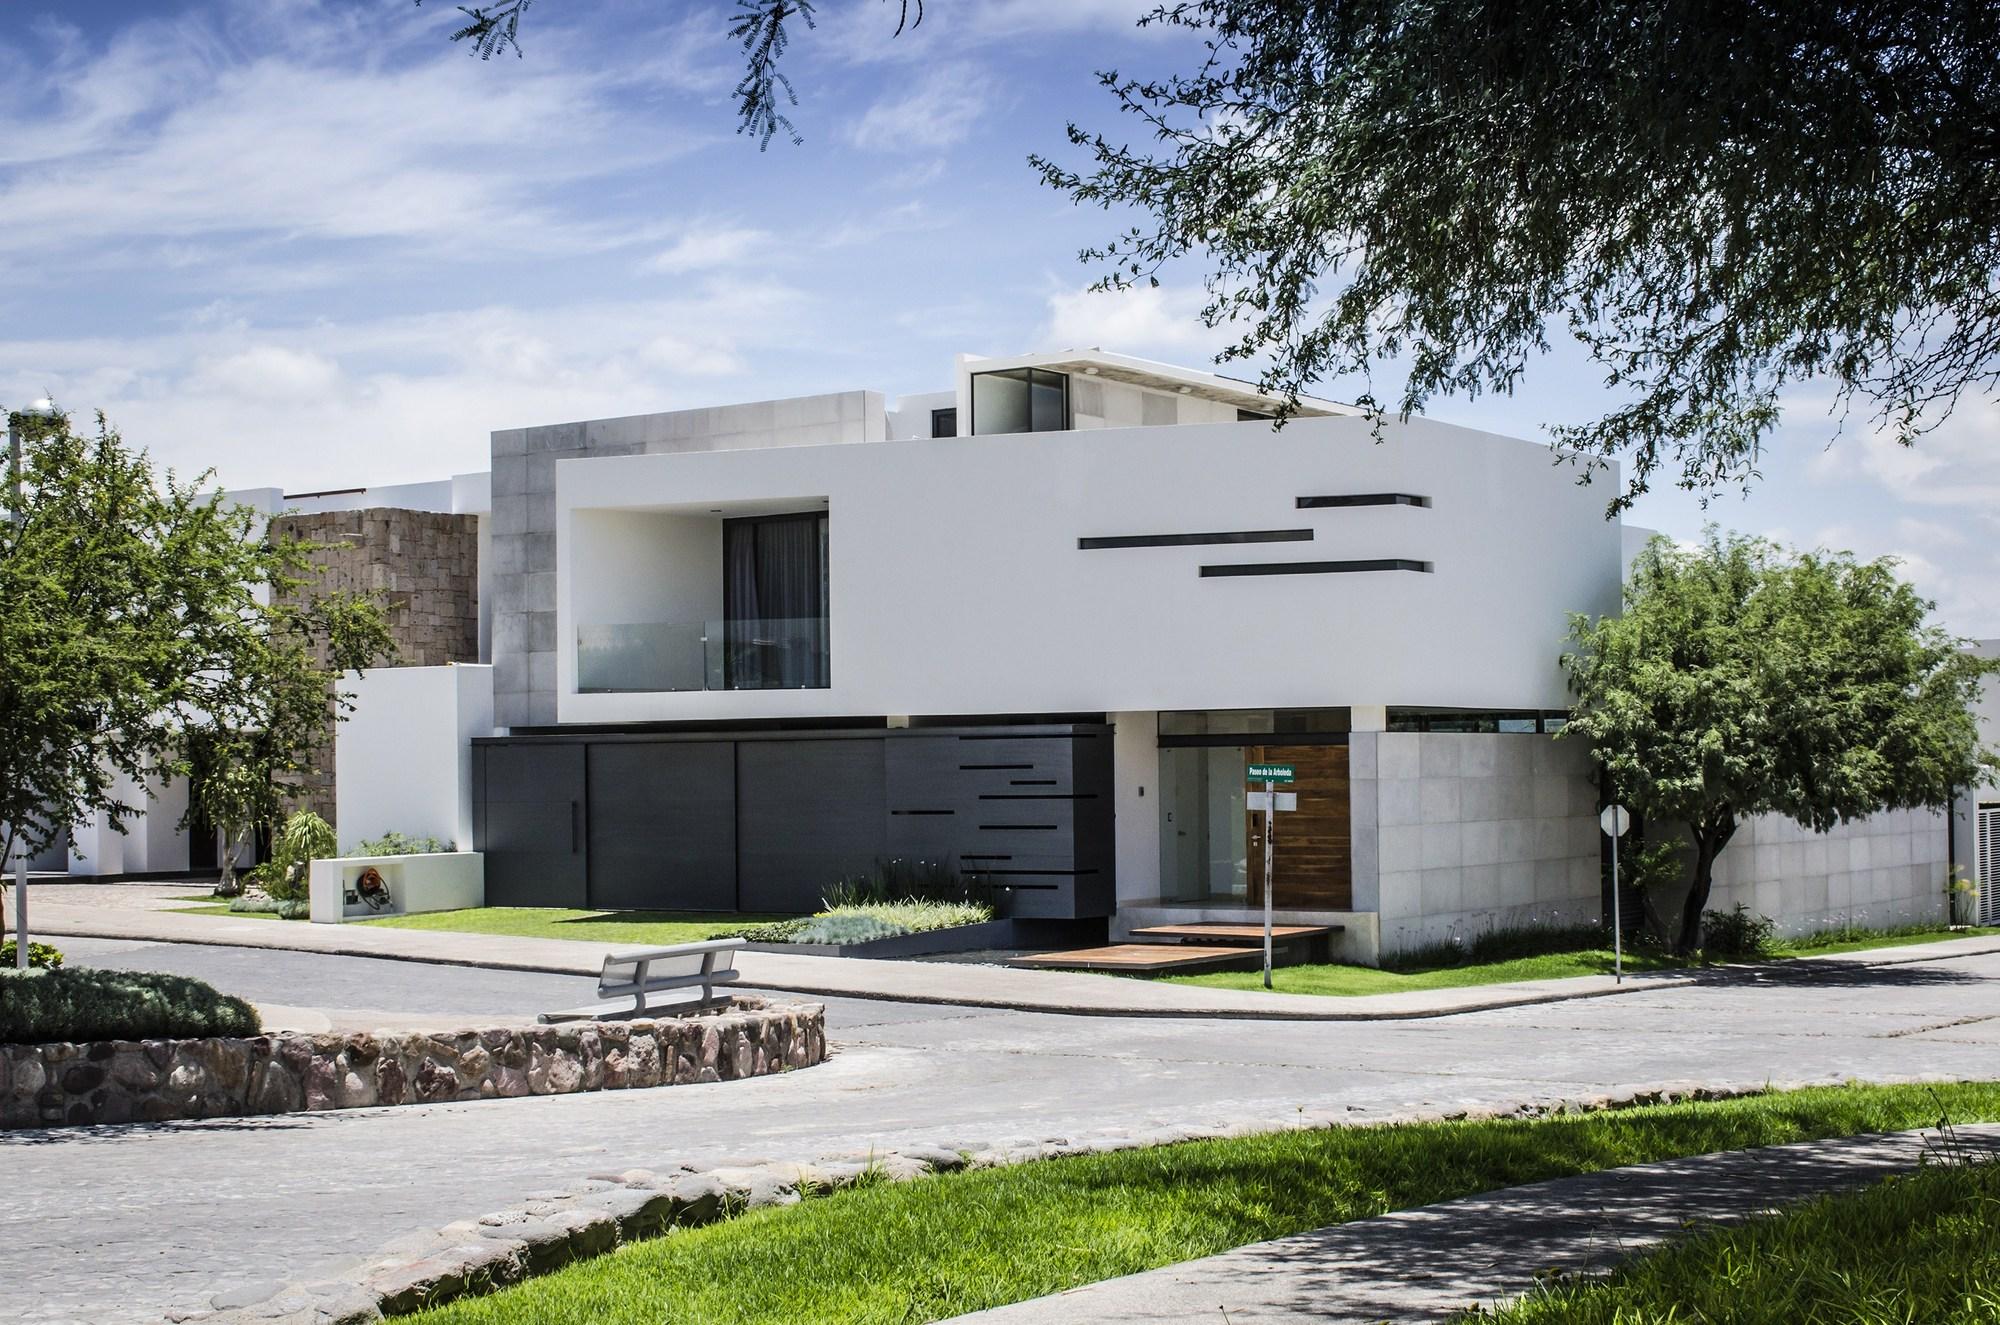 Casa mar a arkylab archdaily m xico for Casas minimalistas 2016